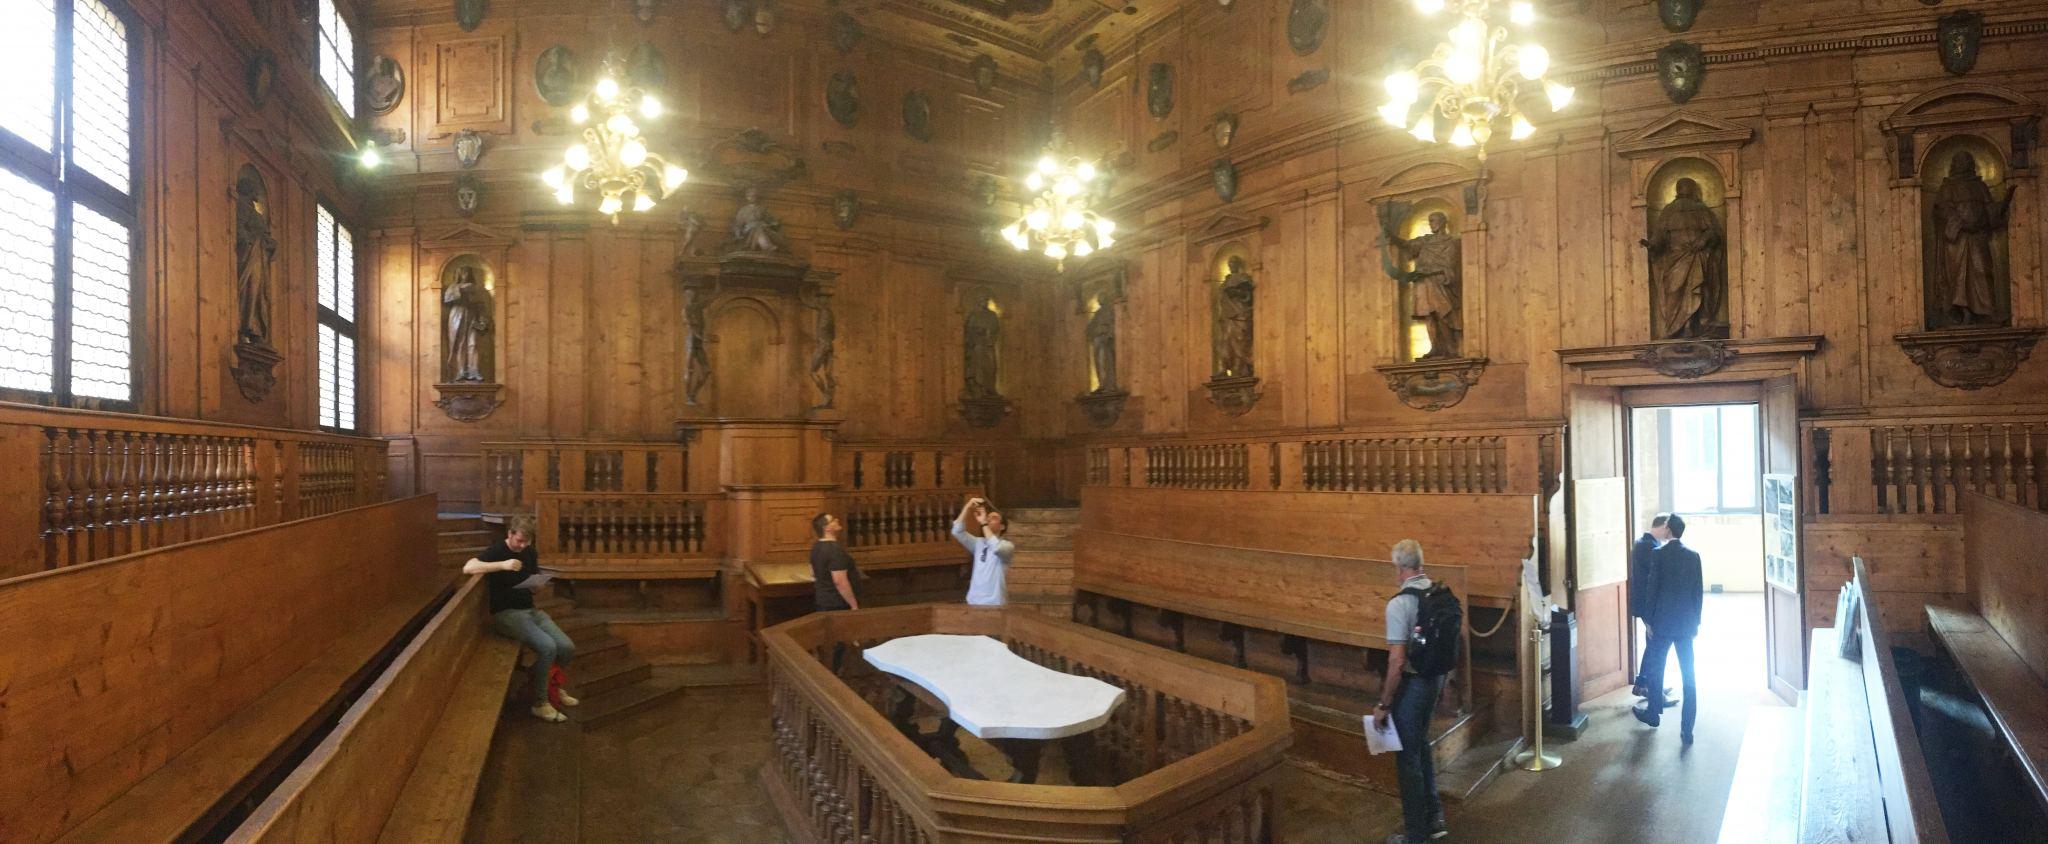 Teatro Anatomico Bologna